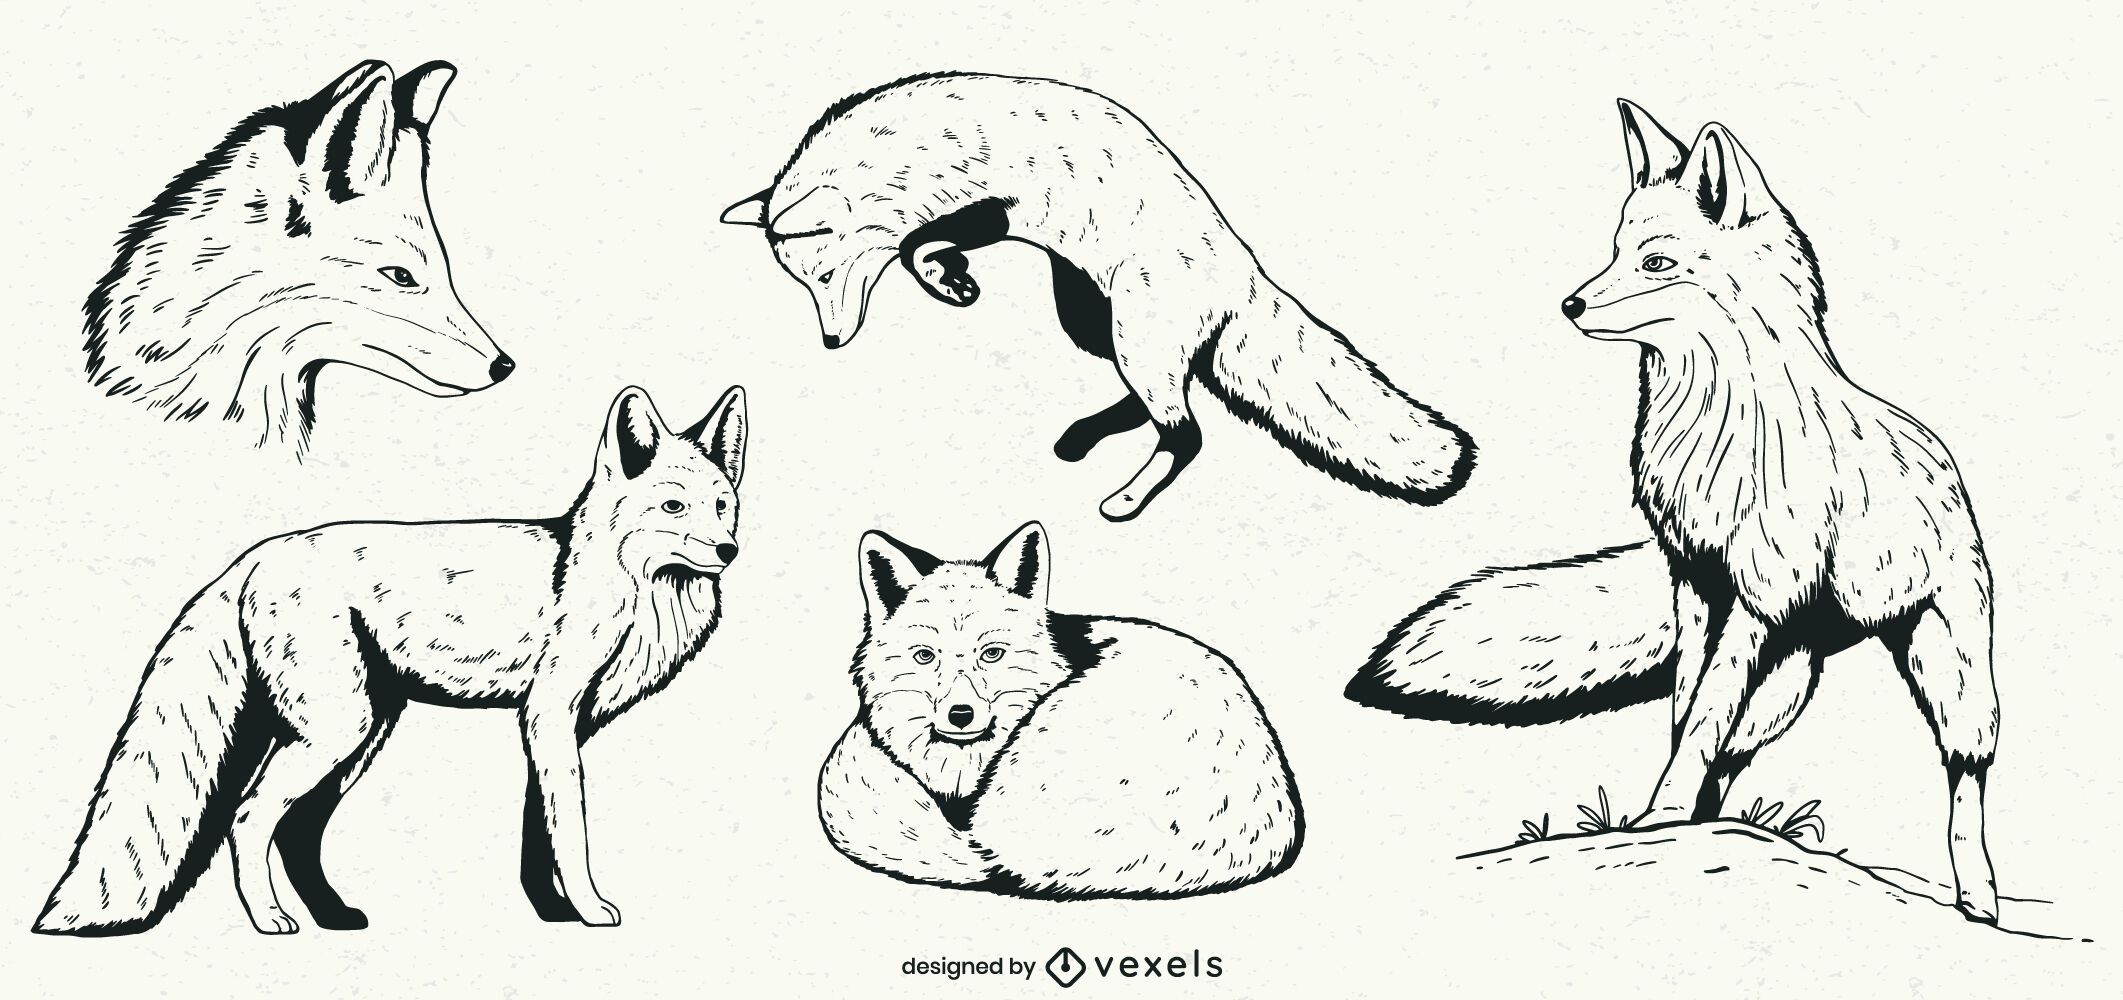 Hand drawn fox illustration set